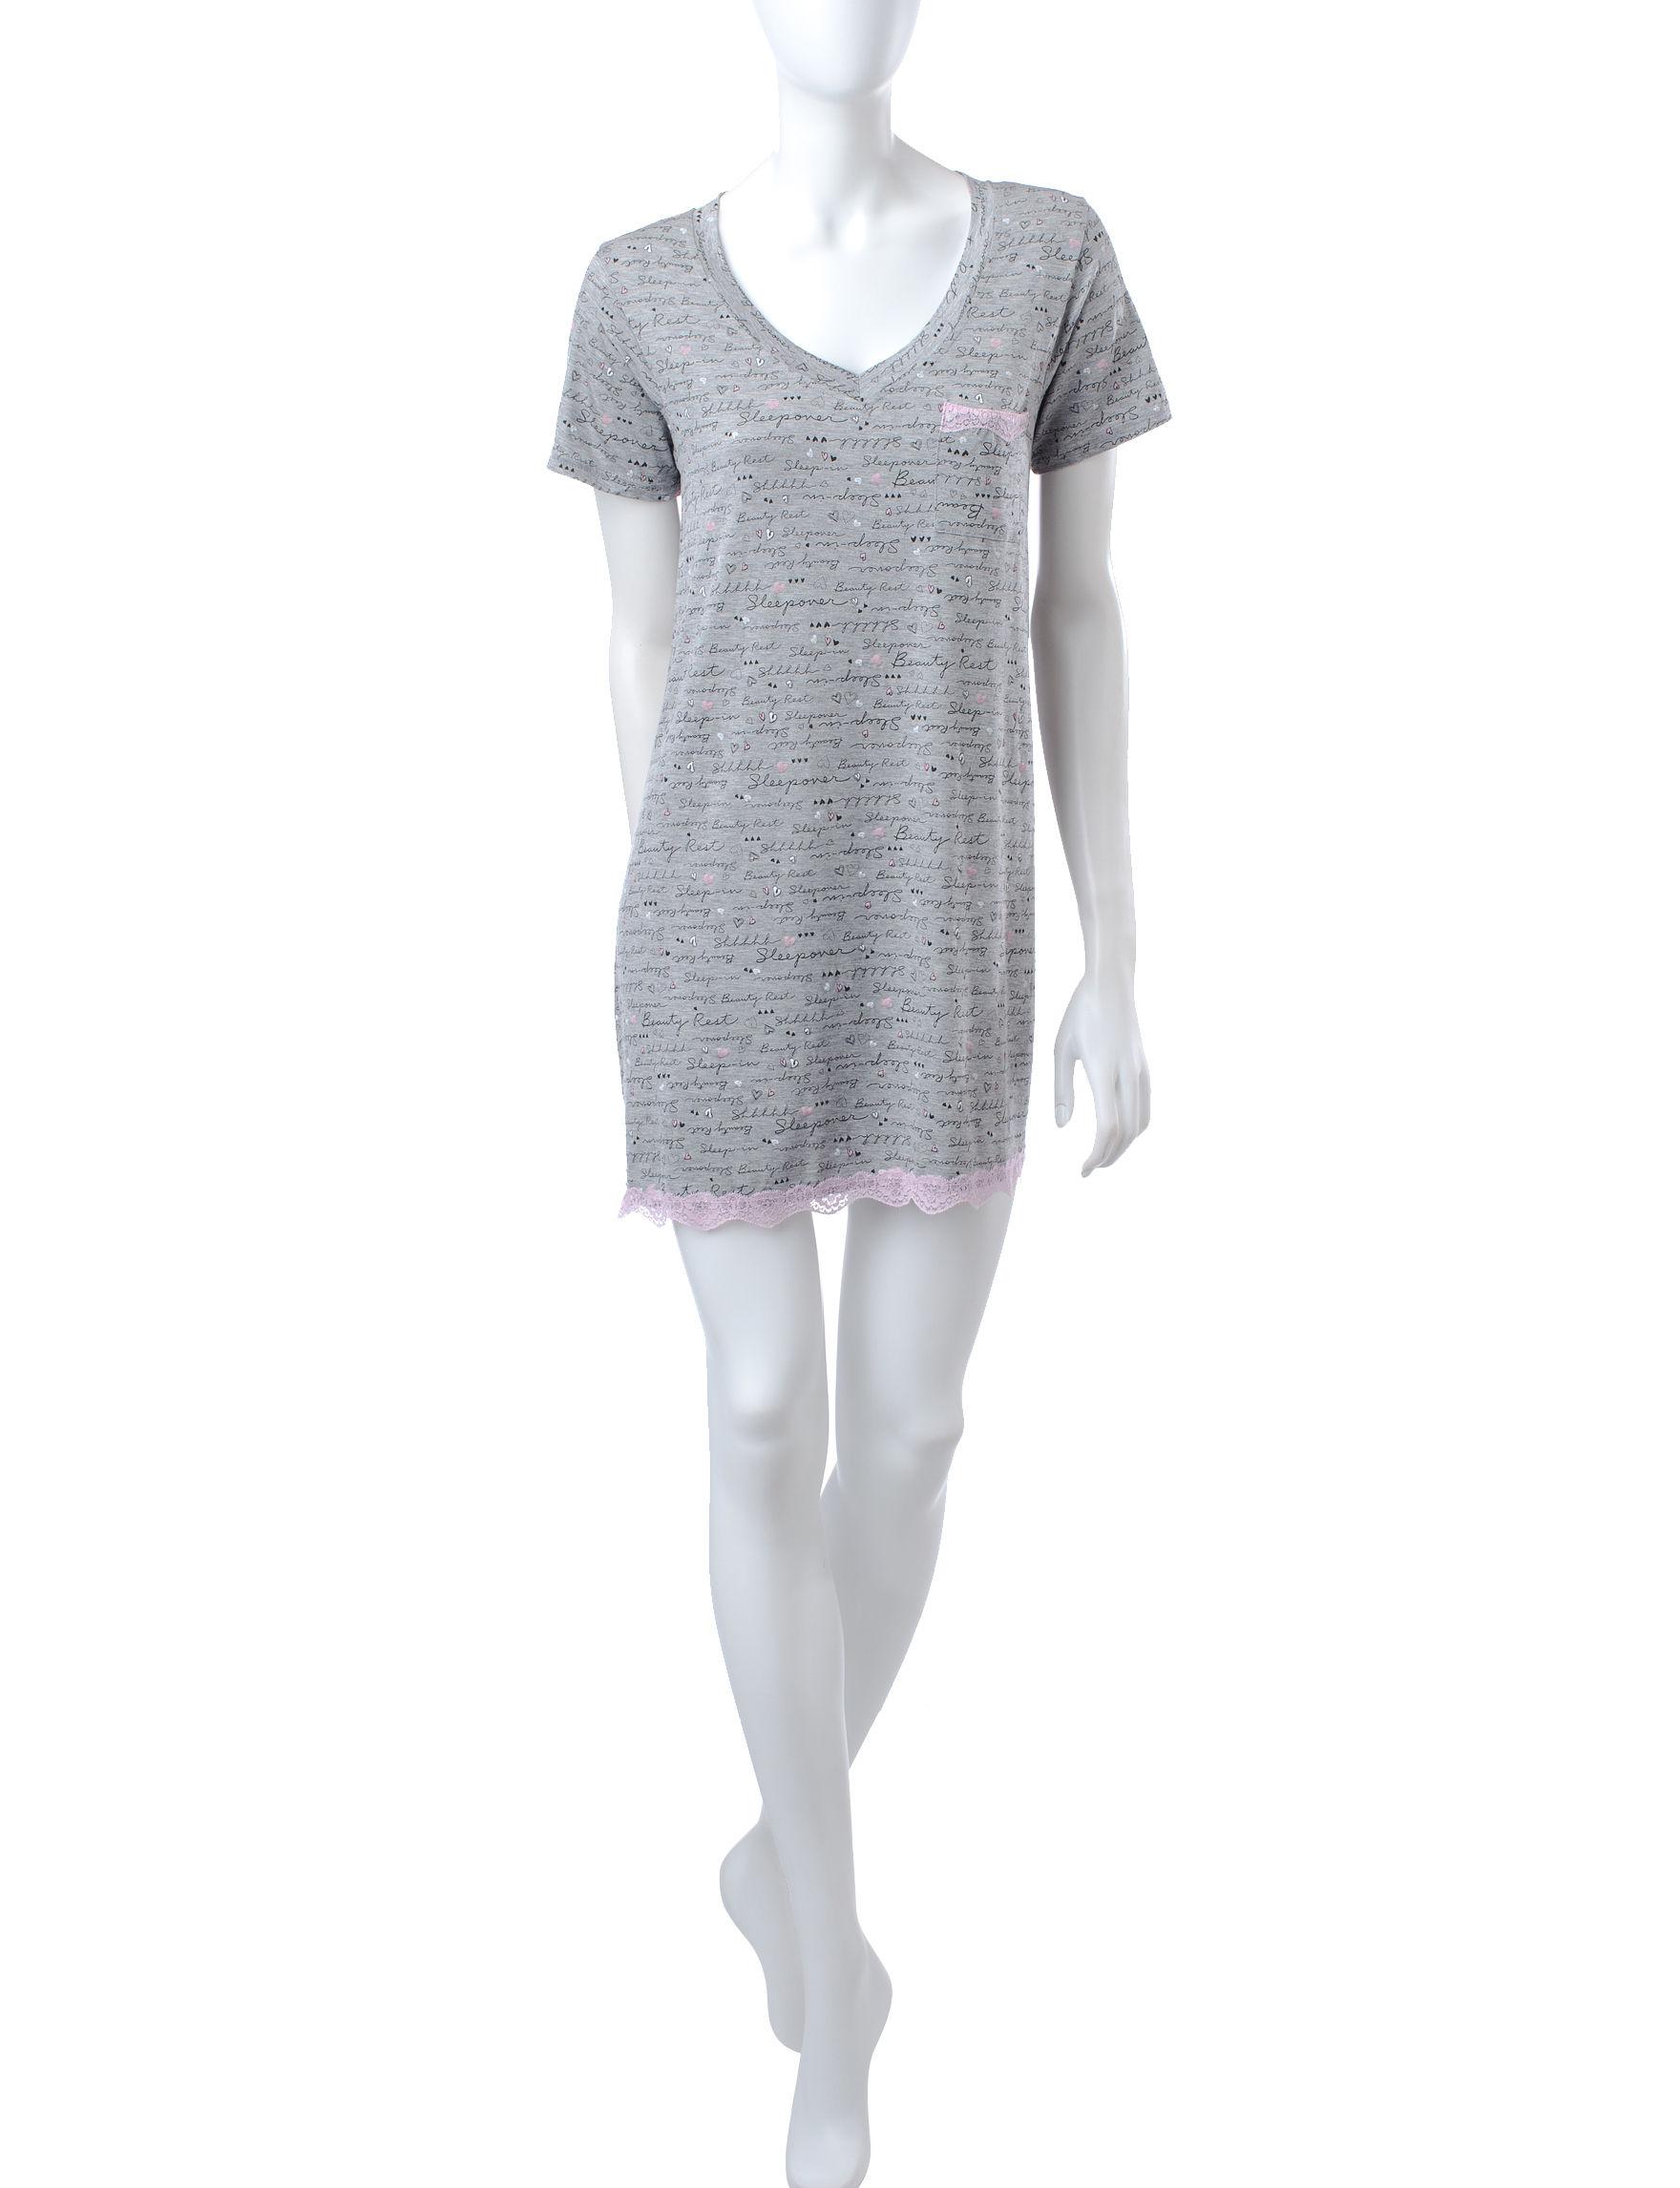 Laura Ashley Grey Nightgowns & Sleep Shirts